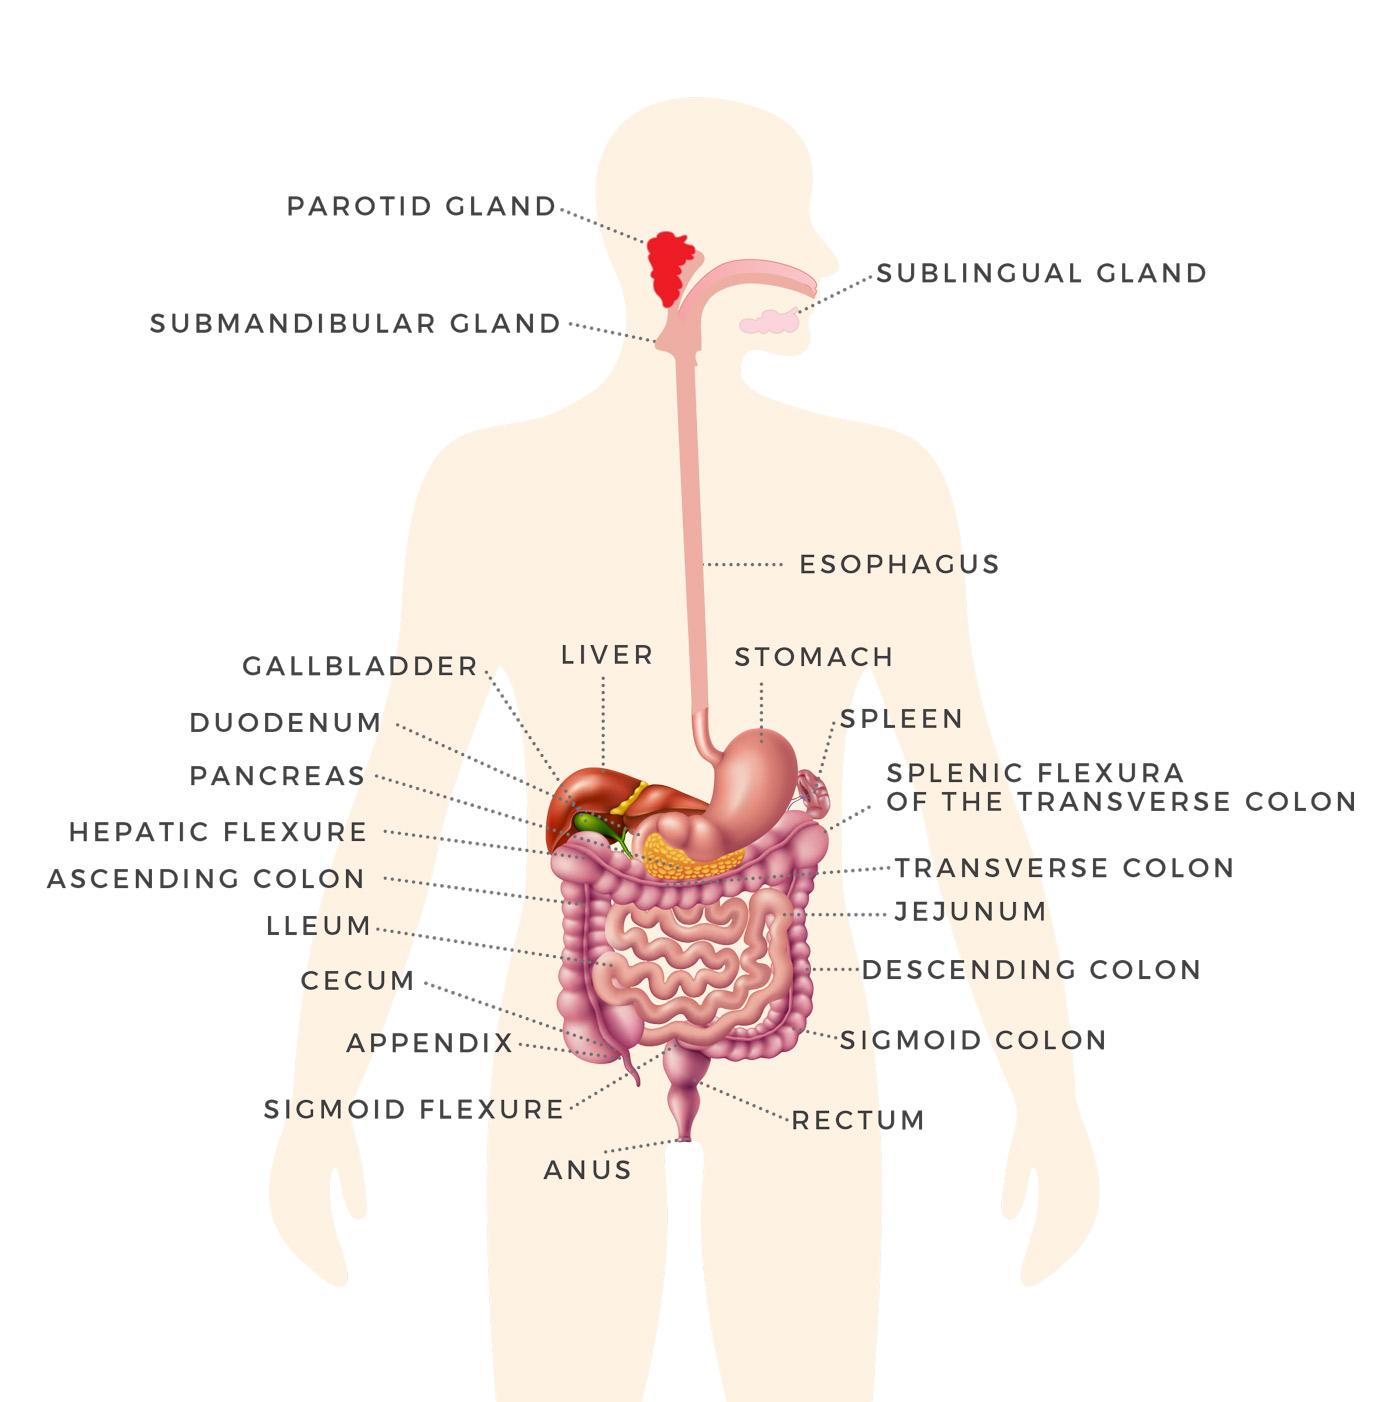 Gastrointestinal-organs